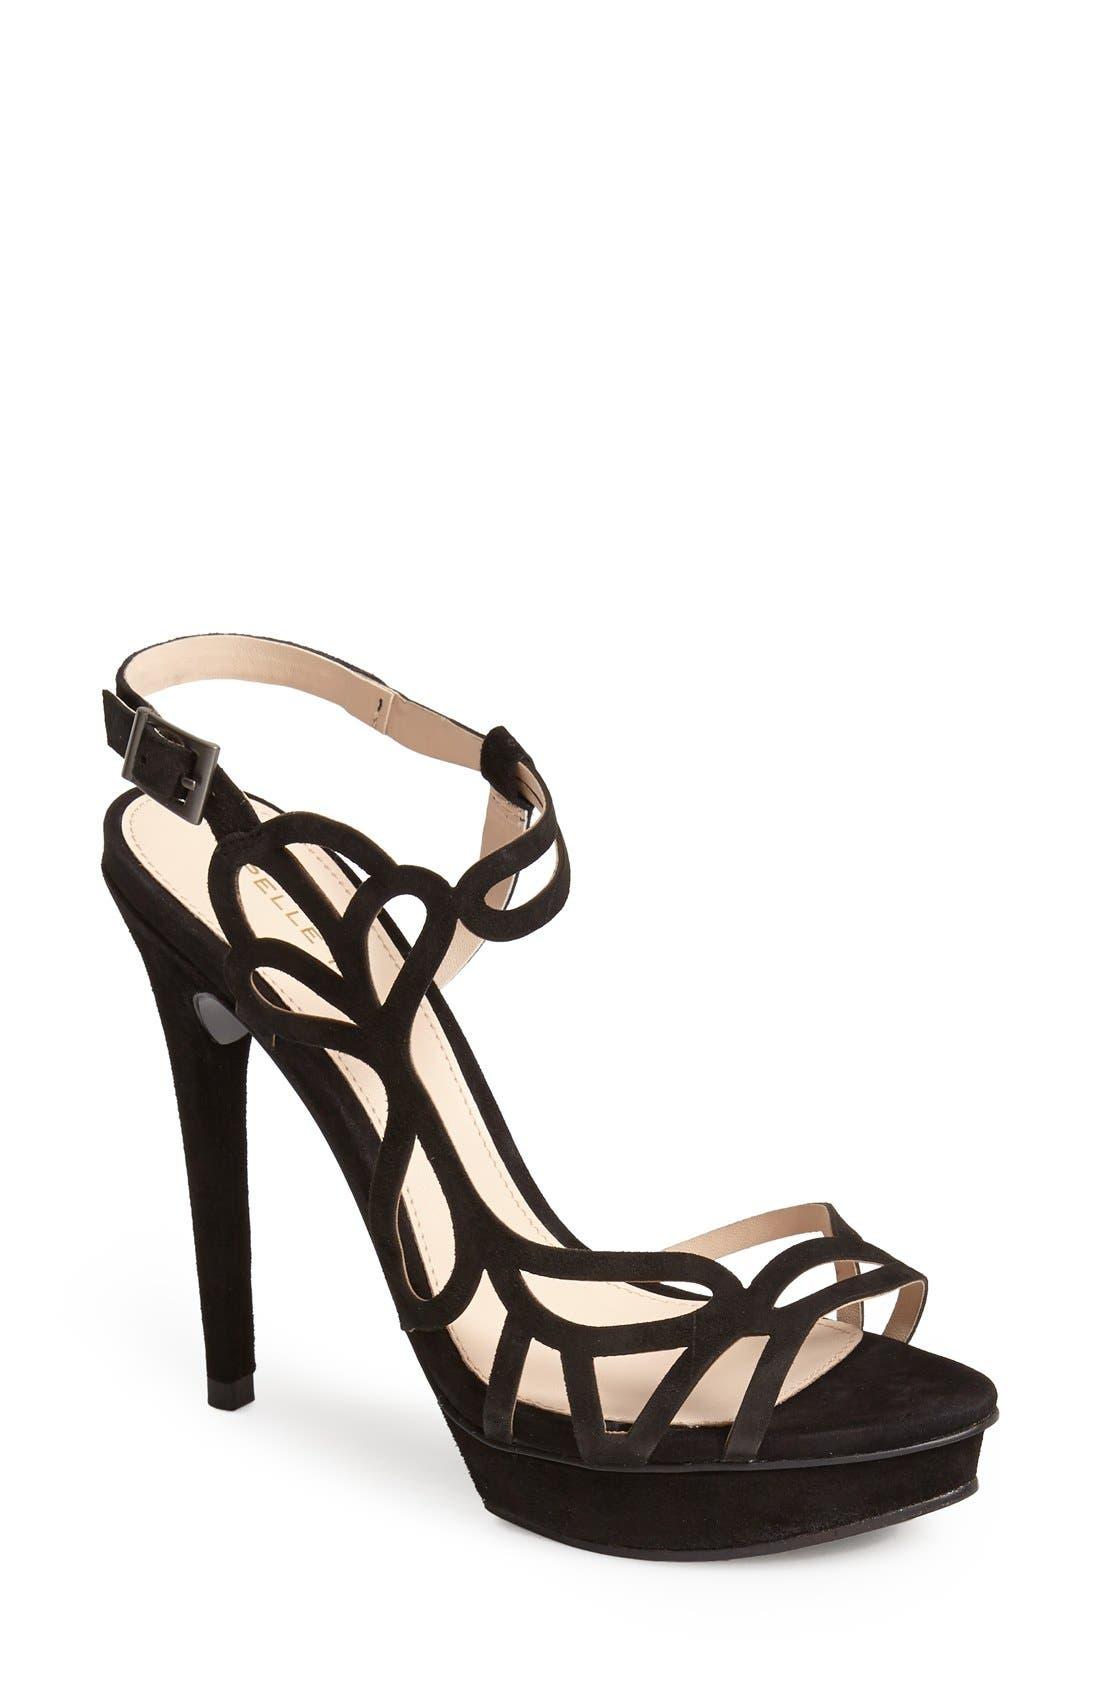 Alternate Image 1 Selected - Pelle Moda 'Fey' Suede Sandal (Women)